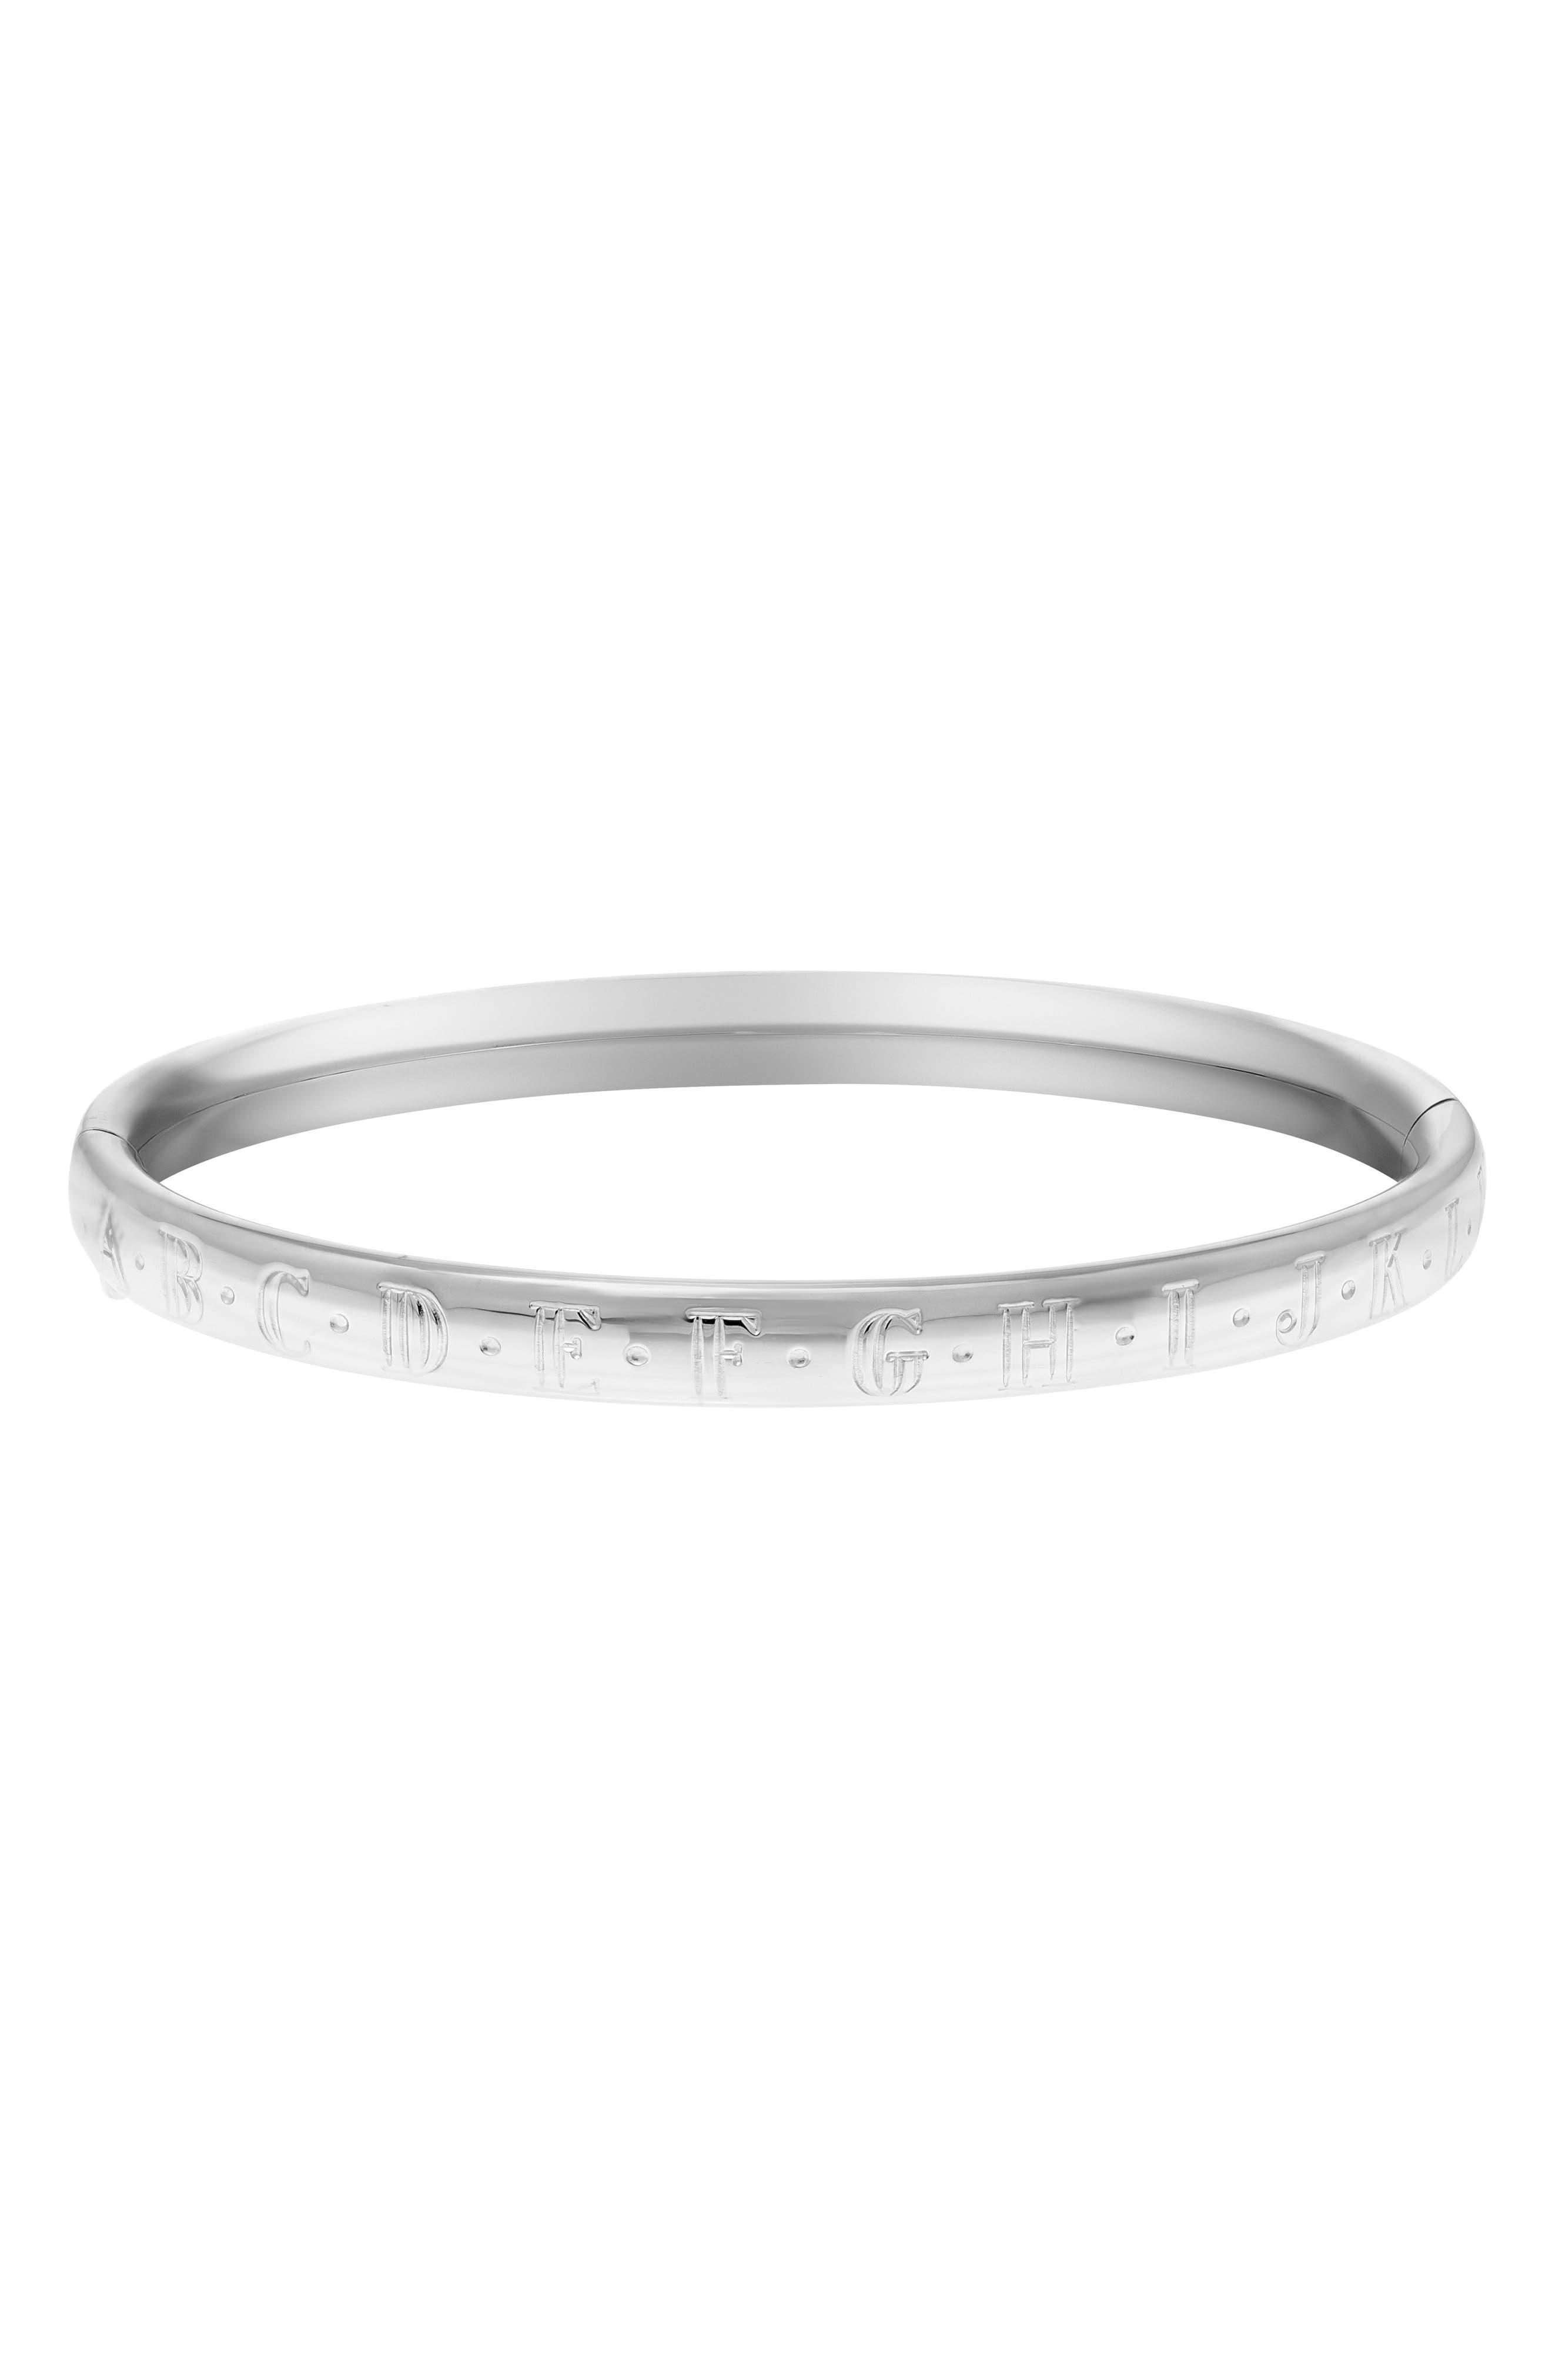 MIGNONETTE, Alphabet Sterling Silver Bracelet, Alternate thumbnail 2, color, STERLING SILVER